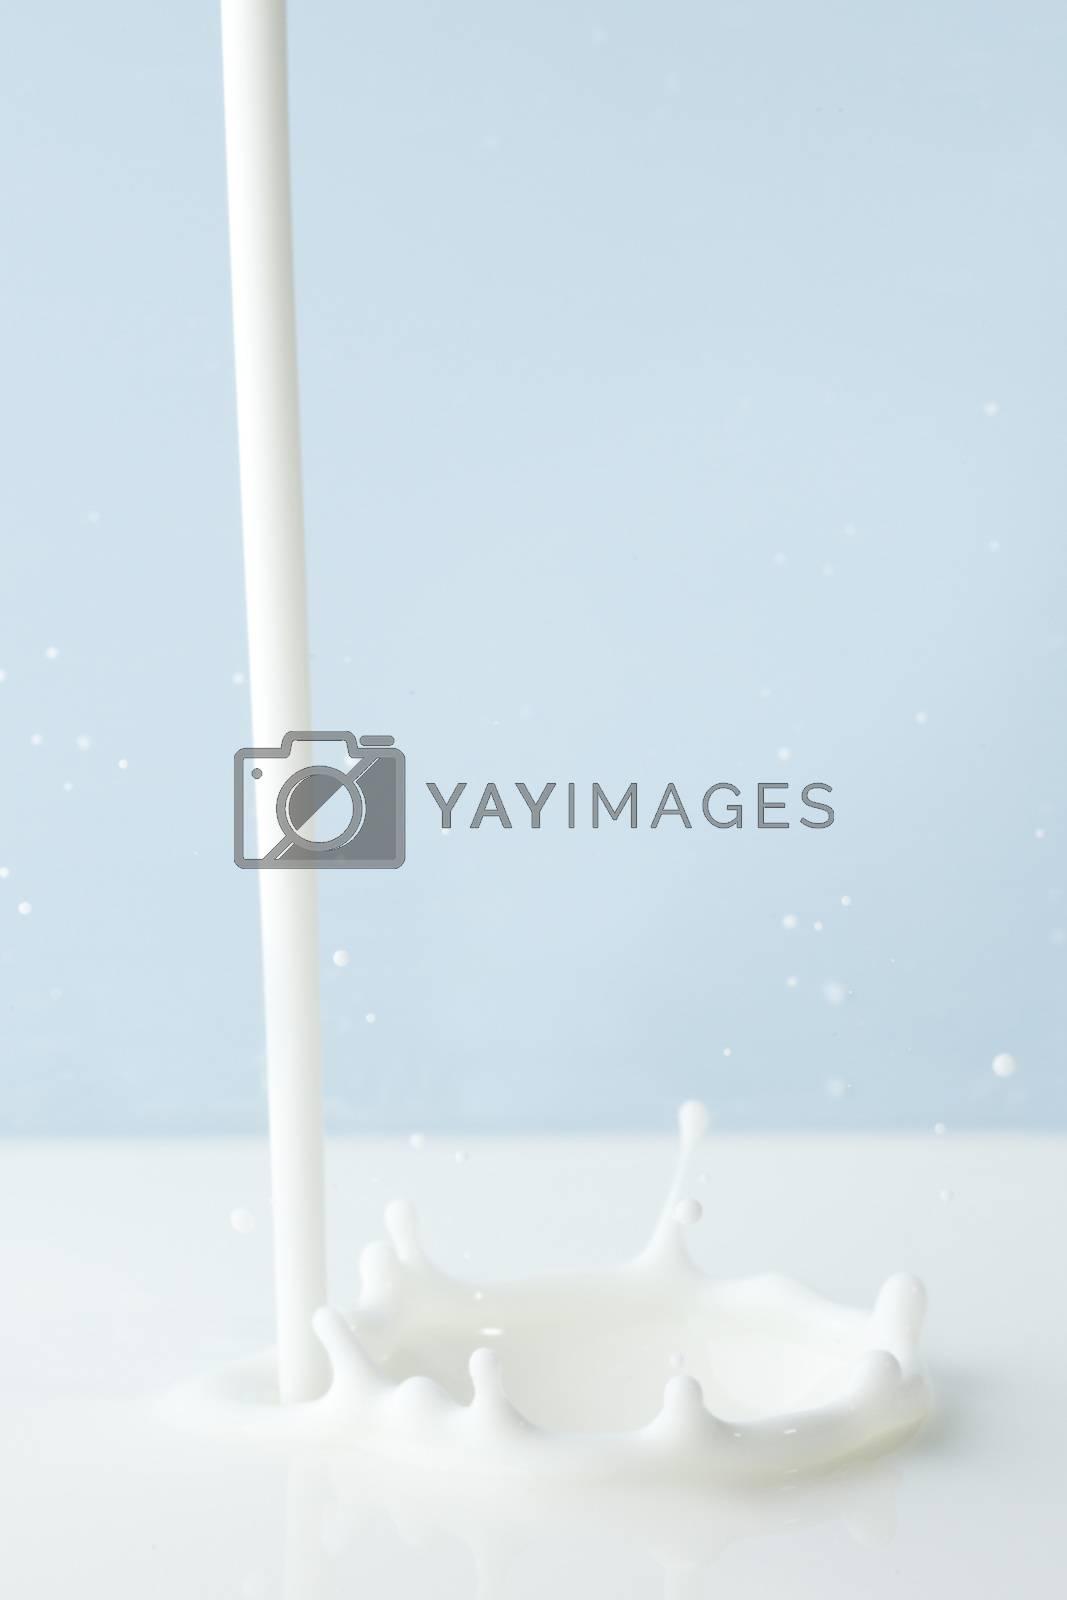 Pouring milk splash on blue background close-up